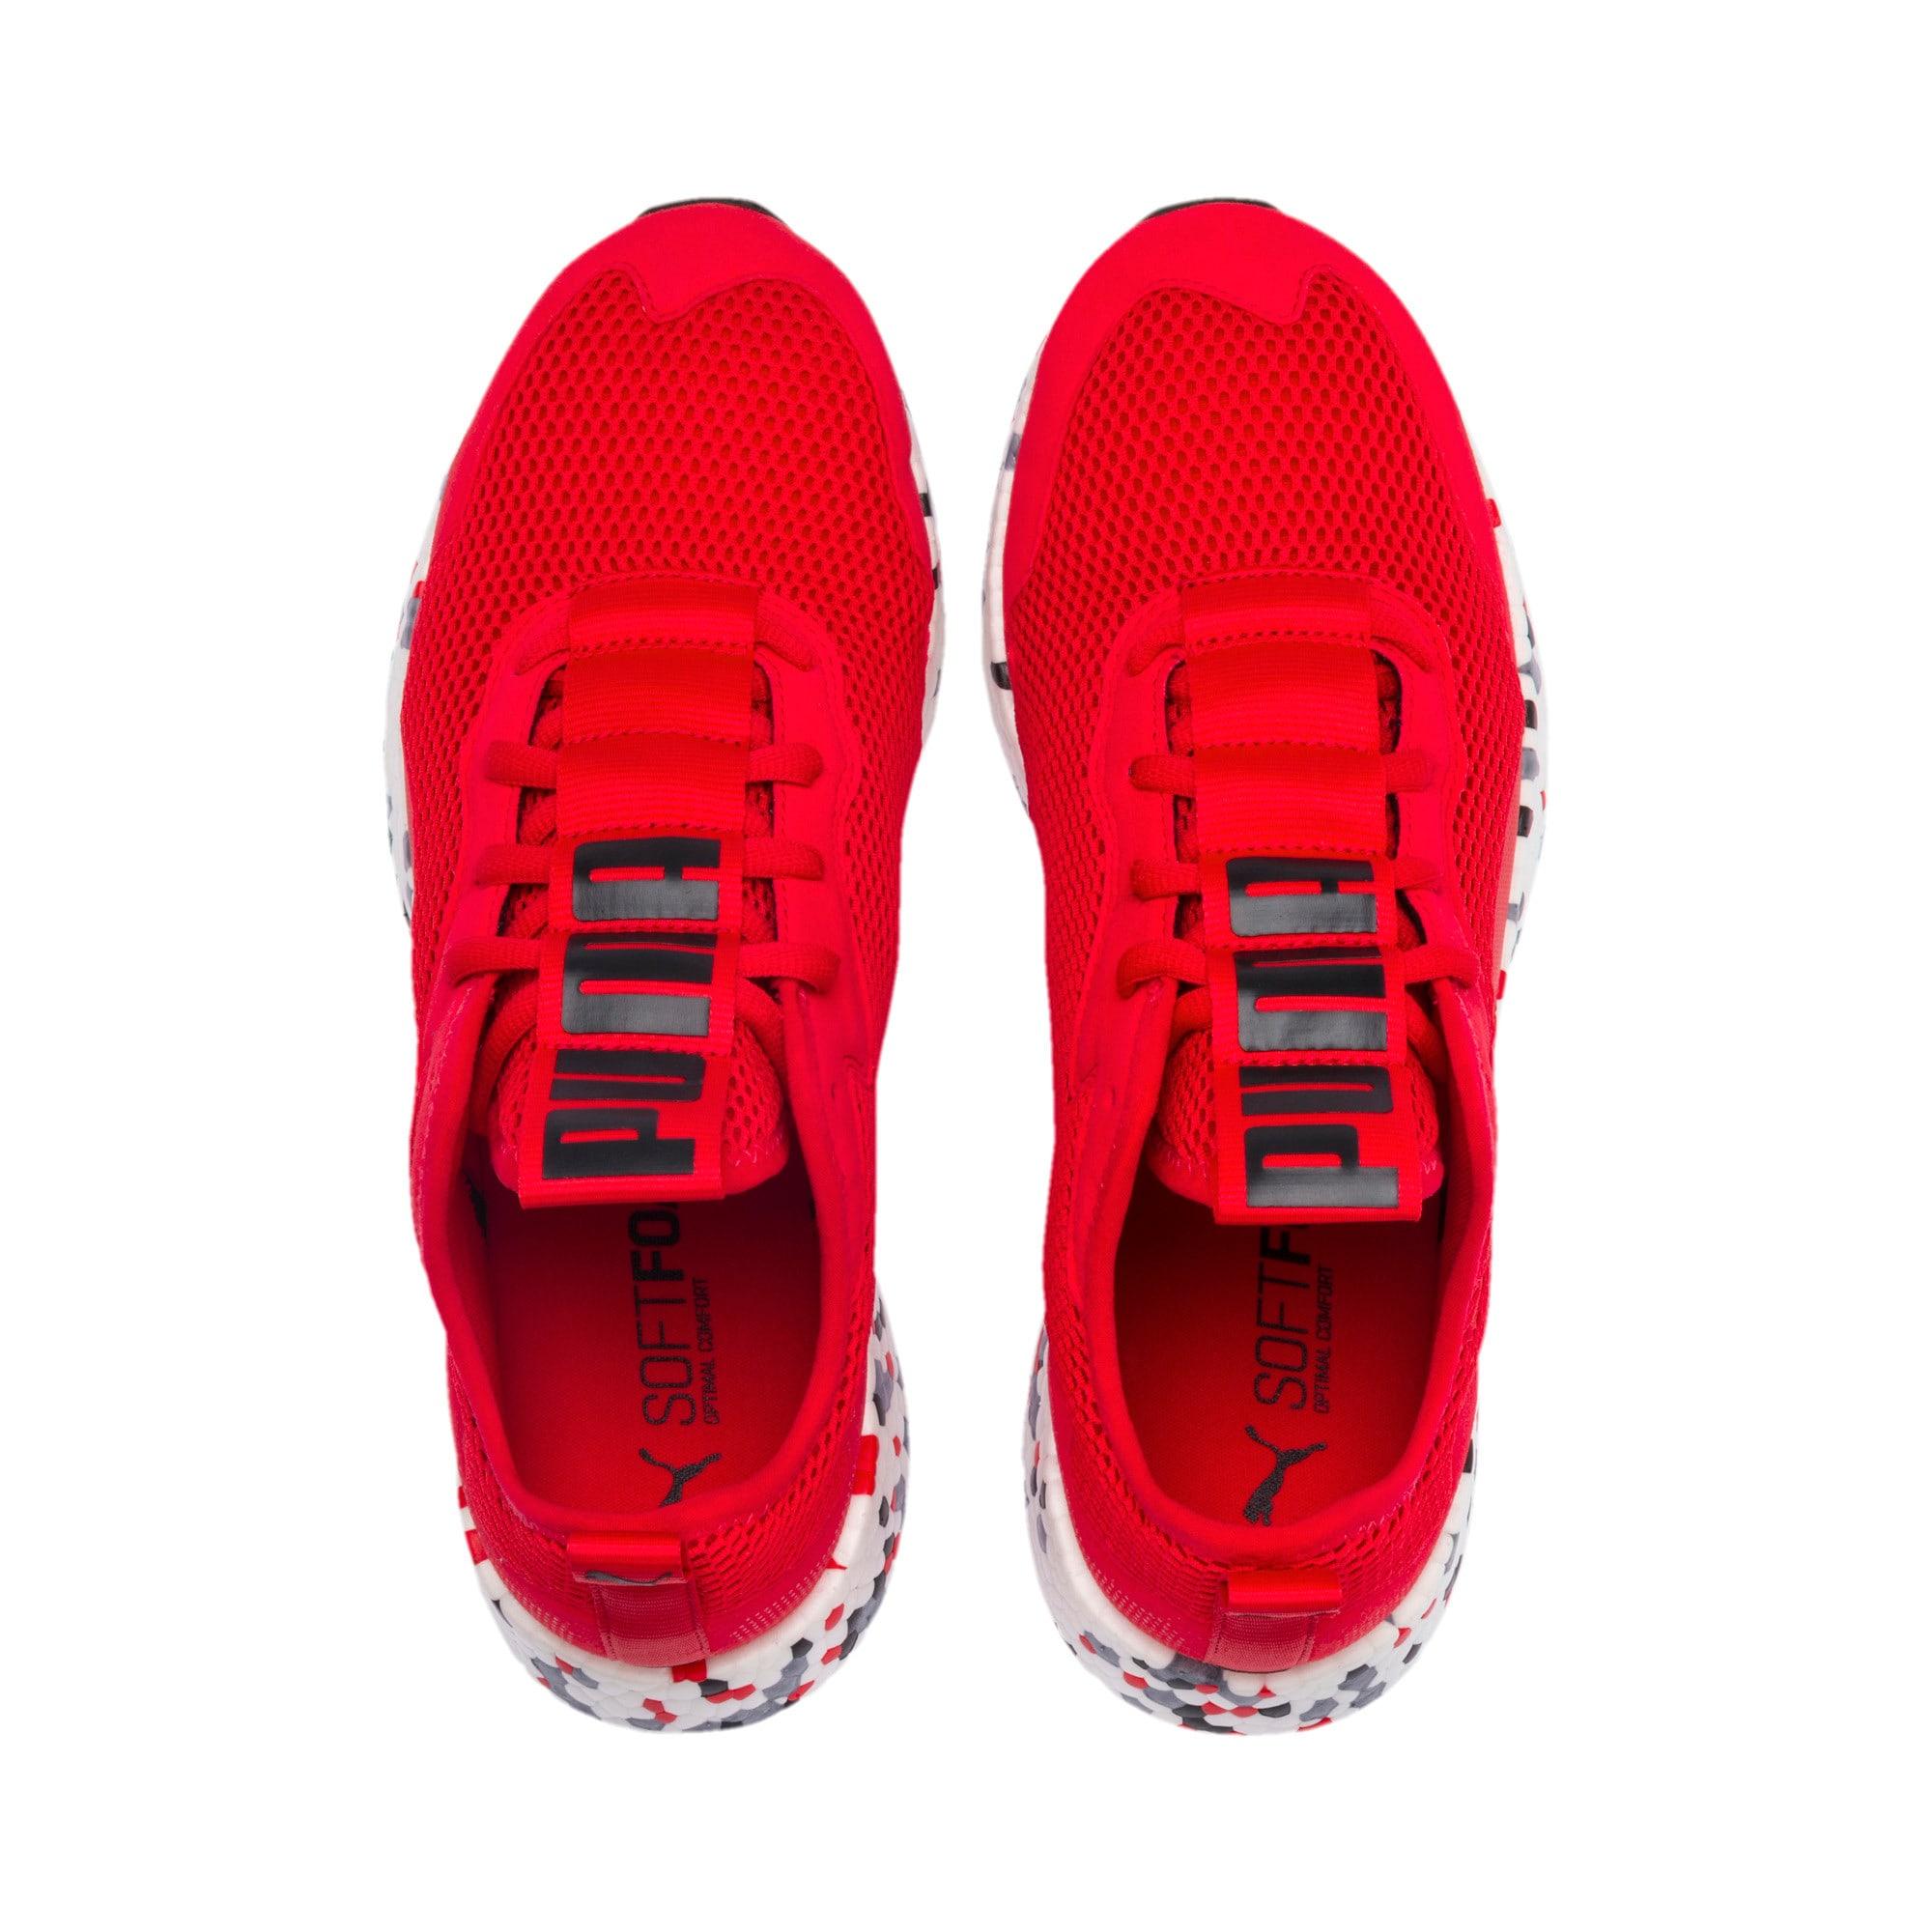 Thumbnail 4 of NRGY Neko Skim Men's Running Shoes, High Risk Red-Puma Black, medium-IND